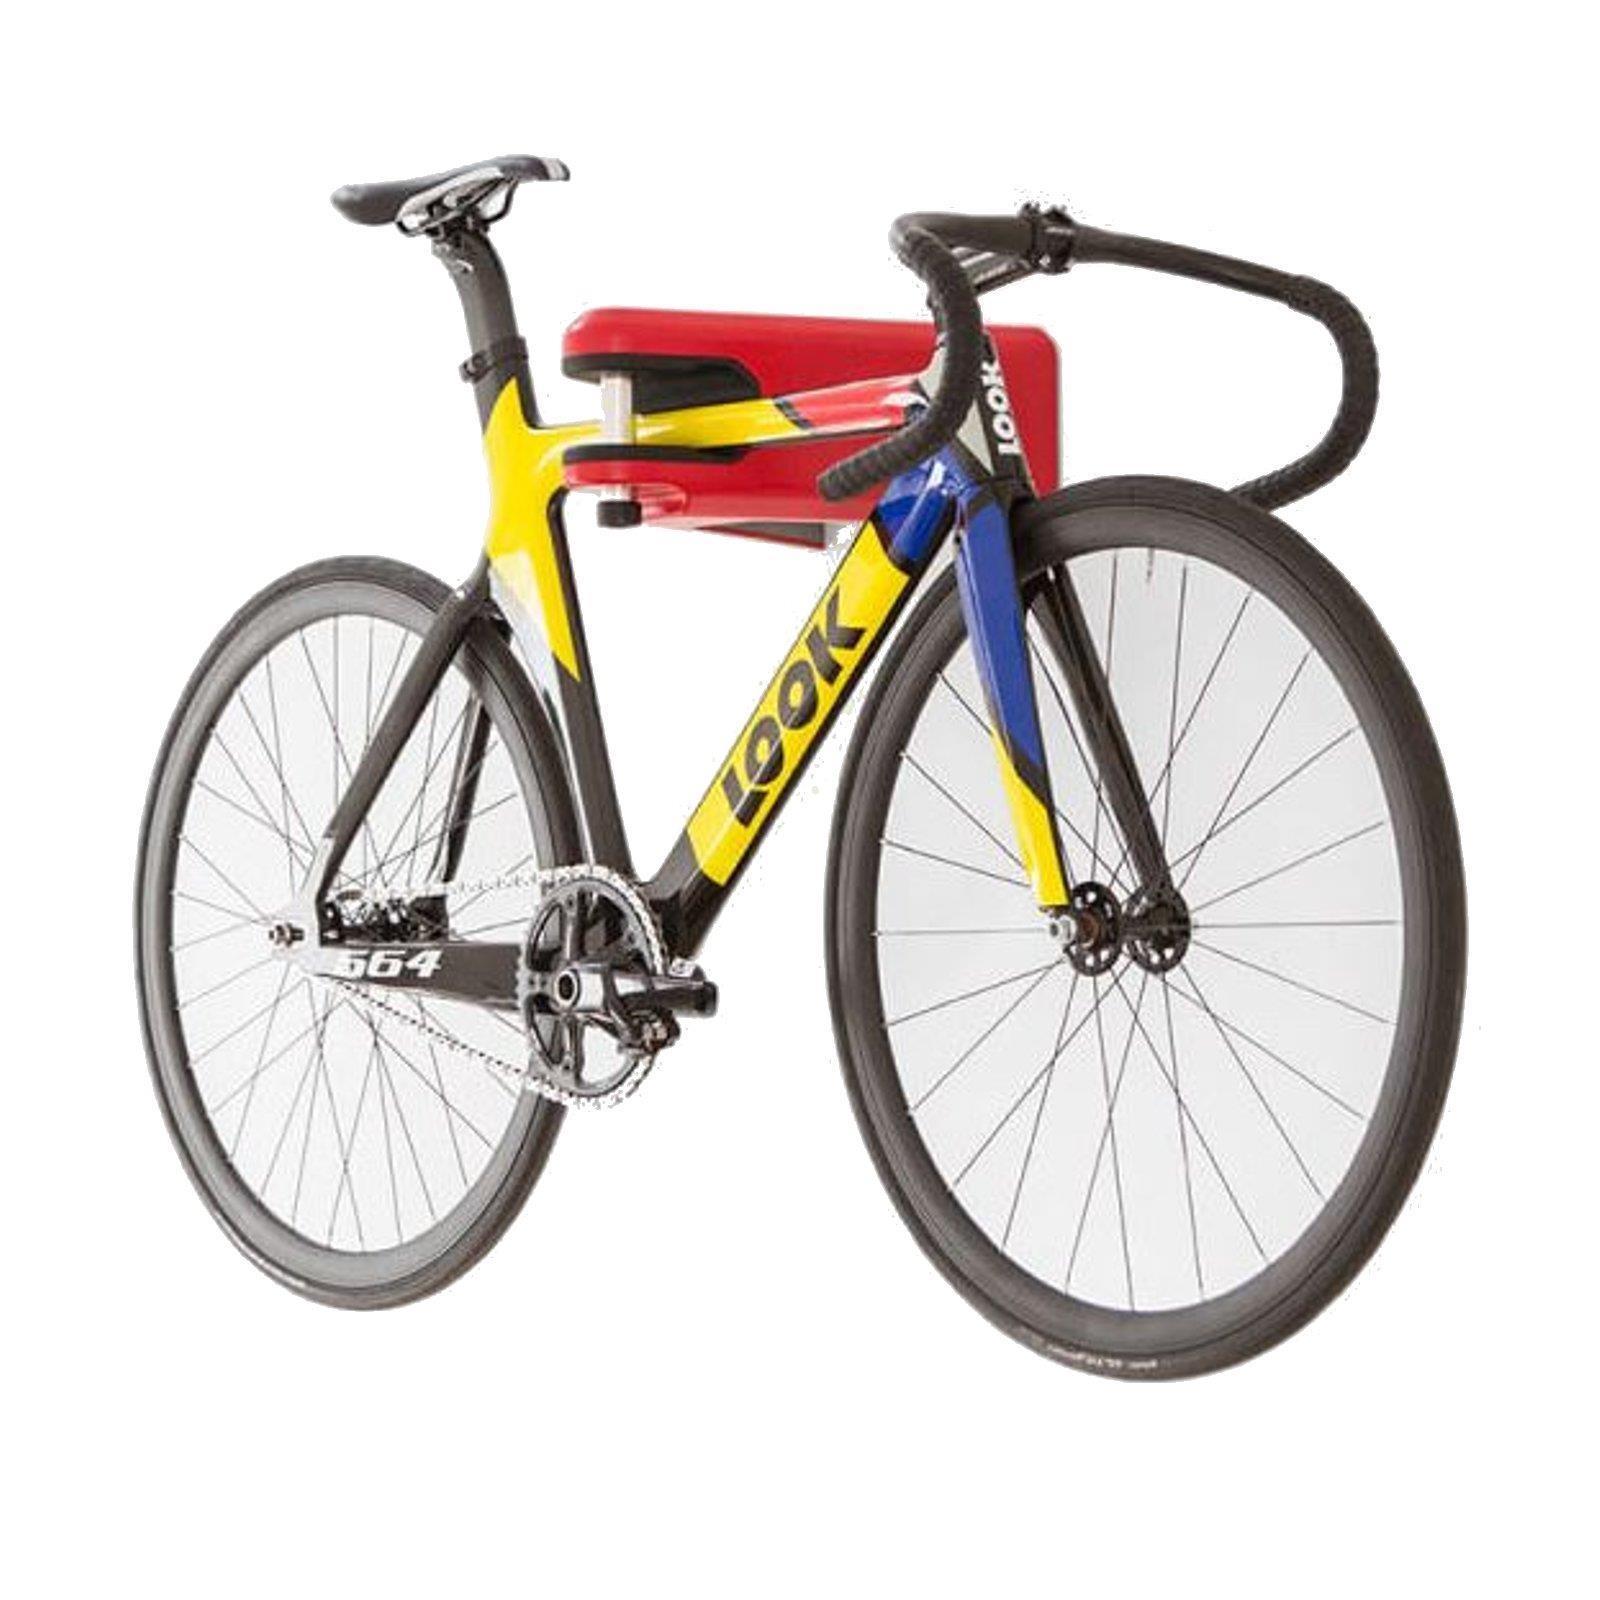 hiplok airlok fahrrad wandhalterung abschlie bar bike. Black Bedroom Furniture Sets. Home Design Ideas